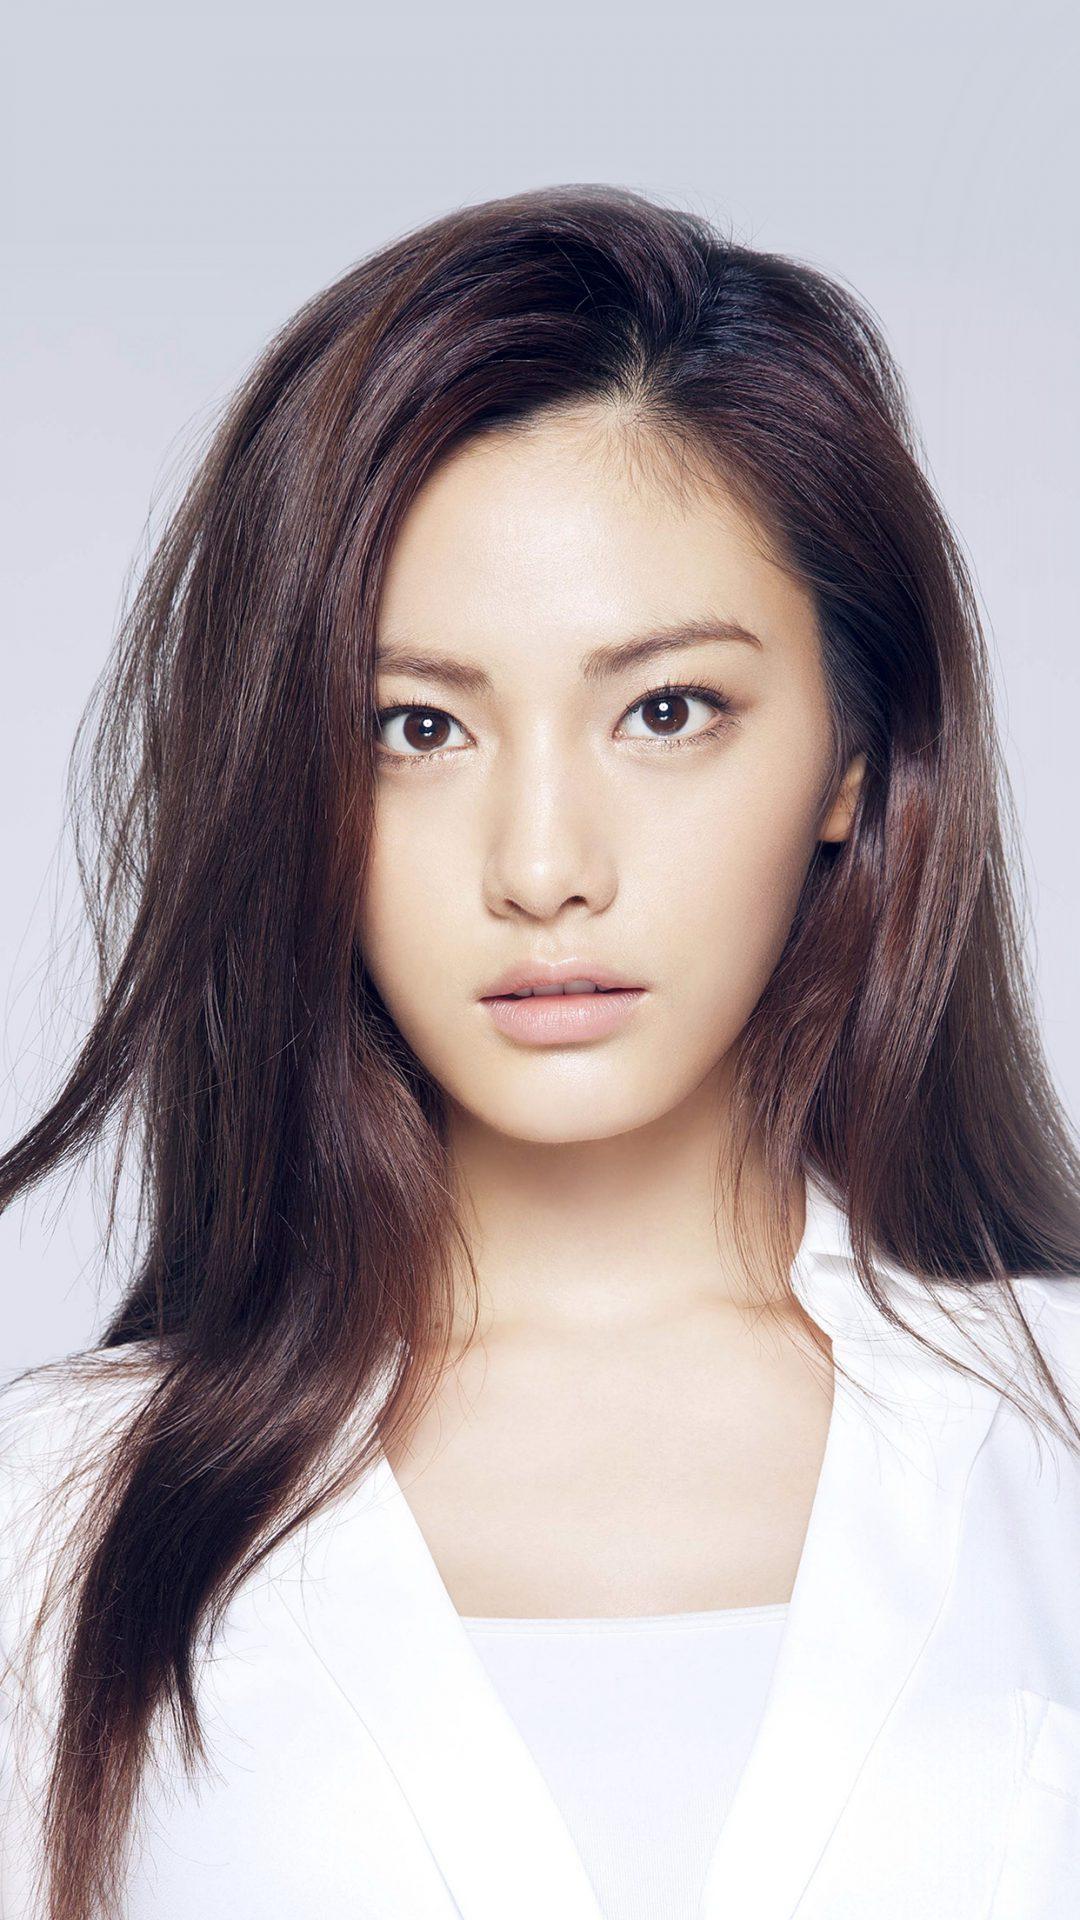 Kpop Nana Beauty